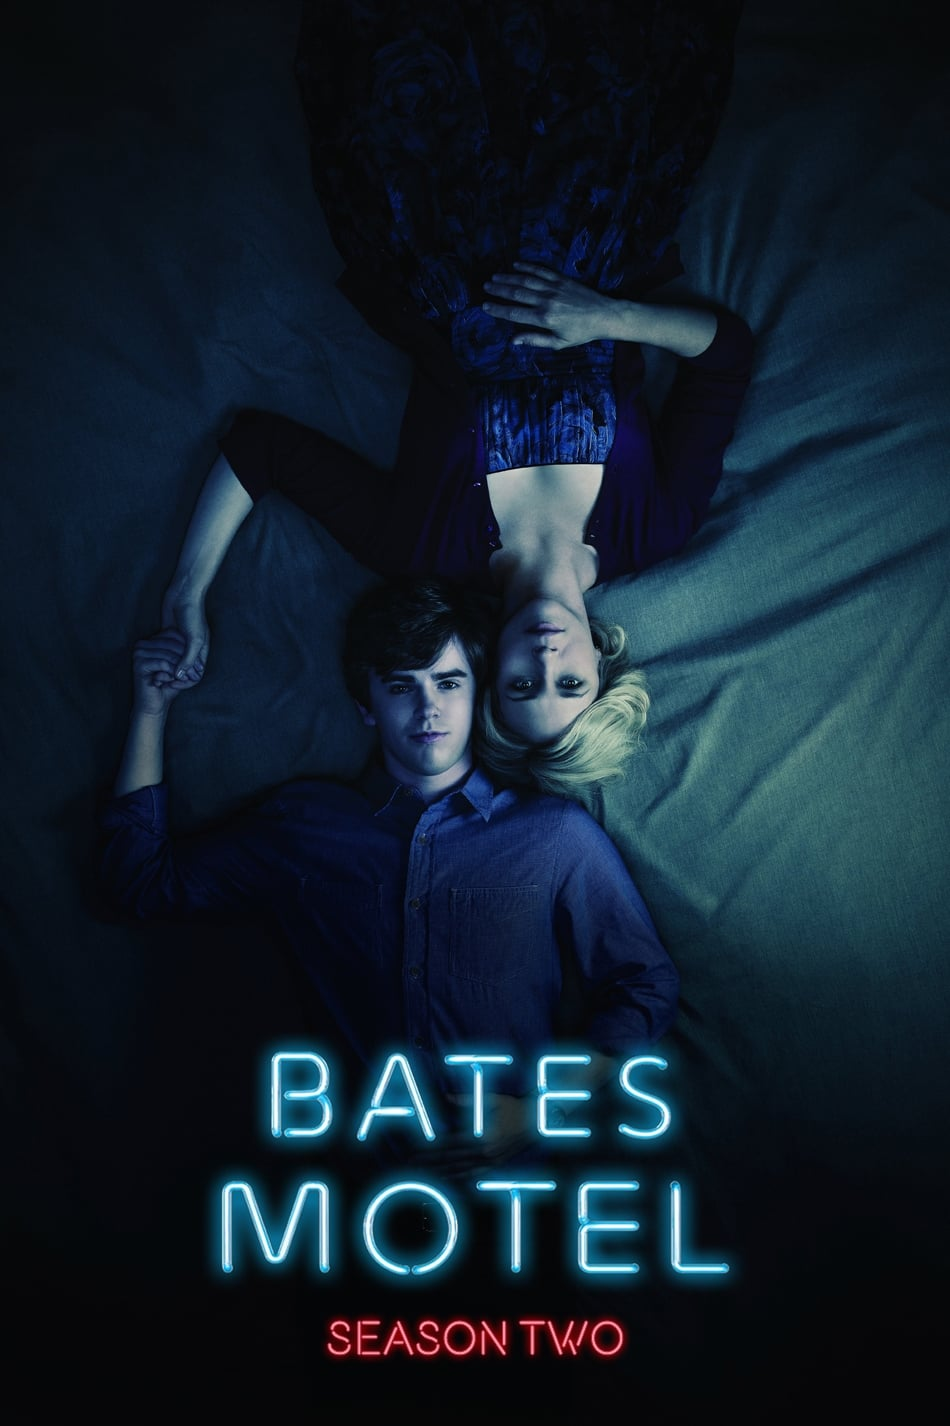 Bates Motel Season 2 ซับไทย ตอนที่ 1-10